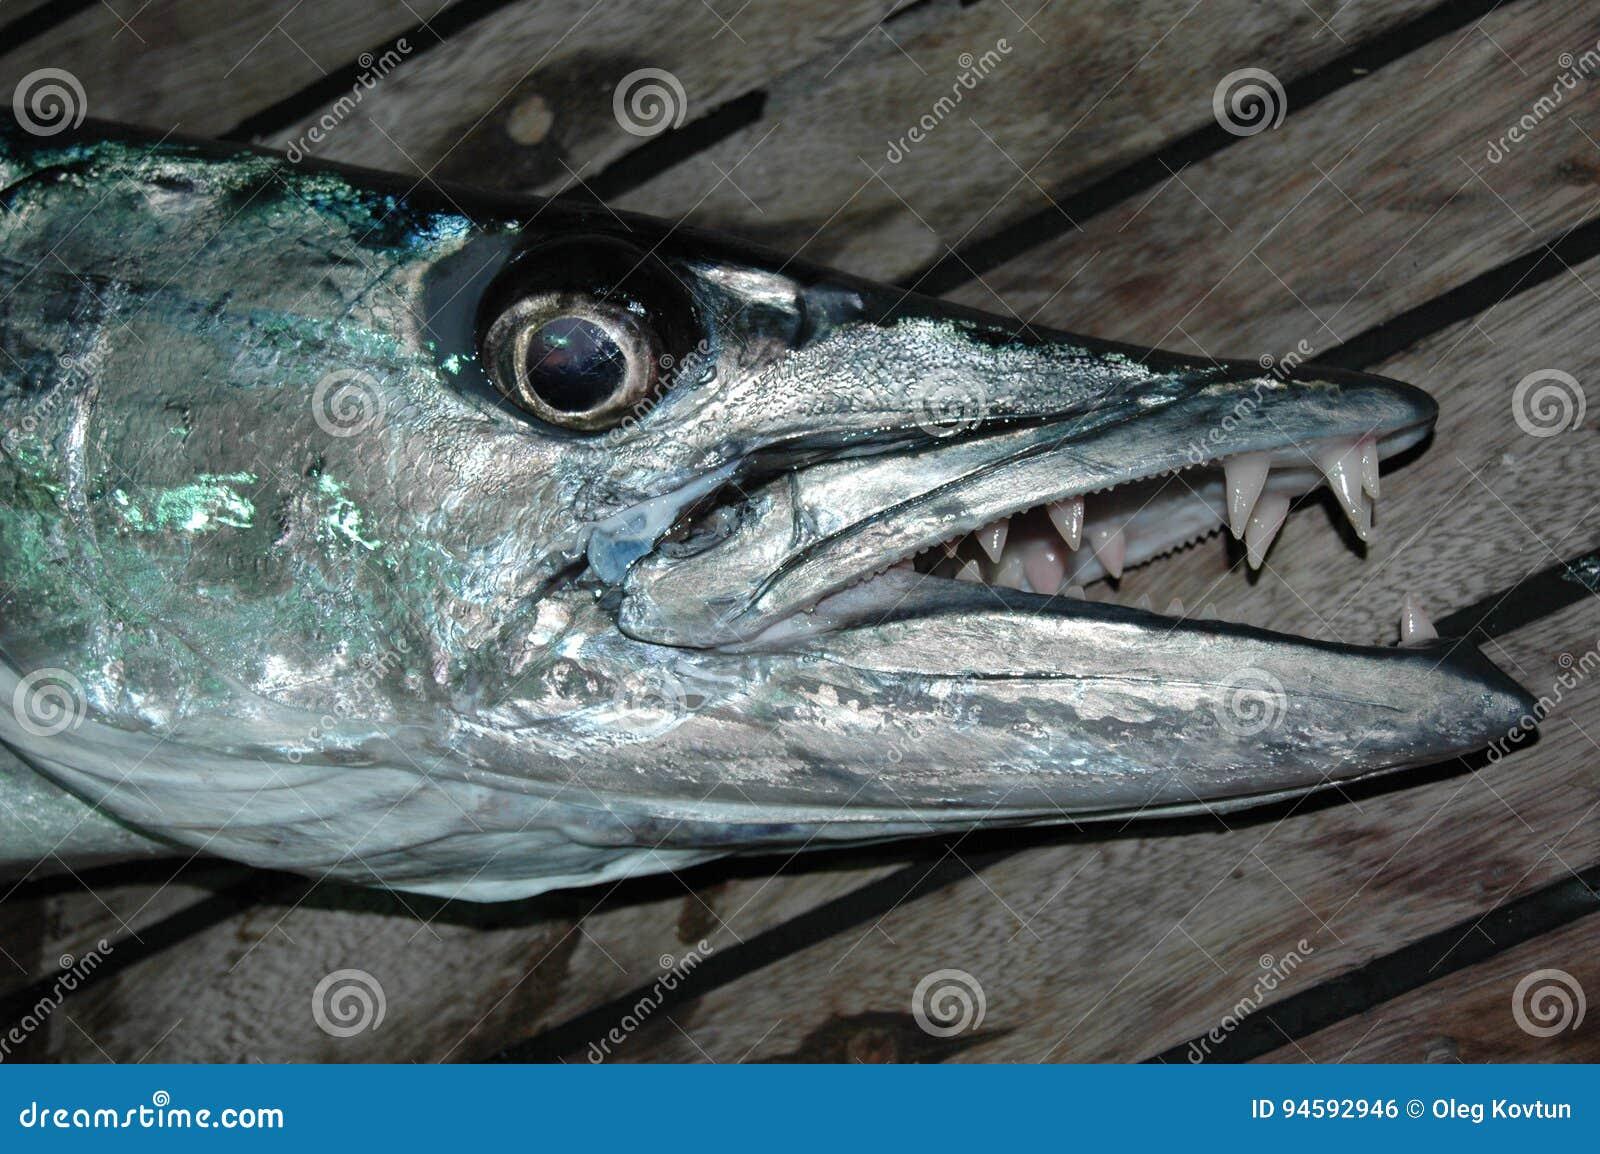 Great Barracuda With Sharp Teeth Stock Photo - Image of ...